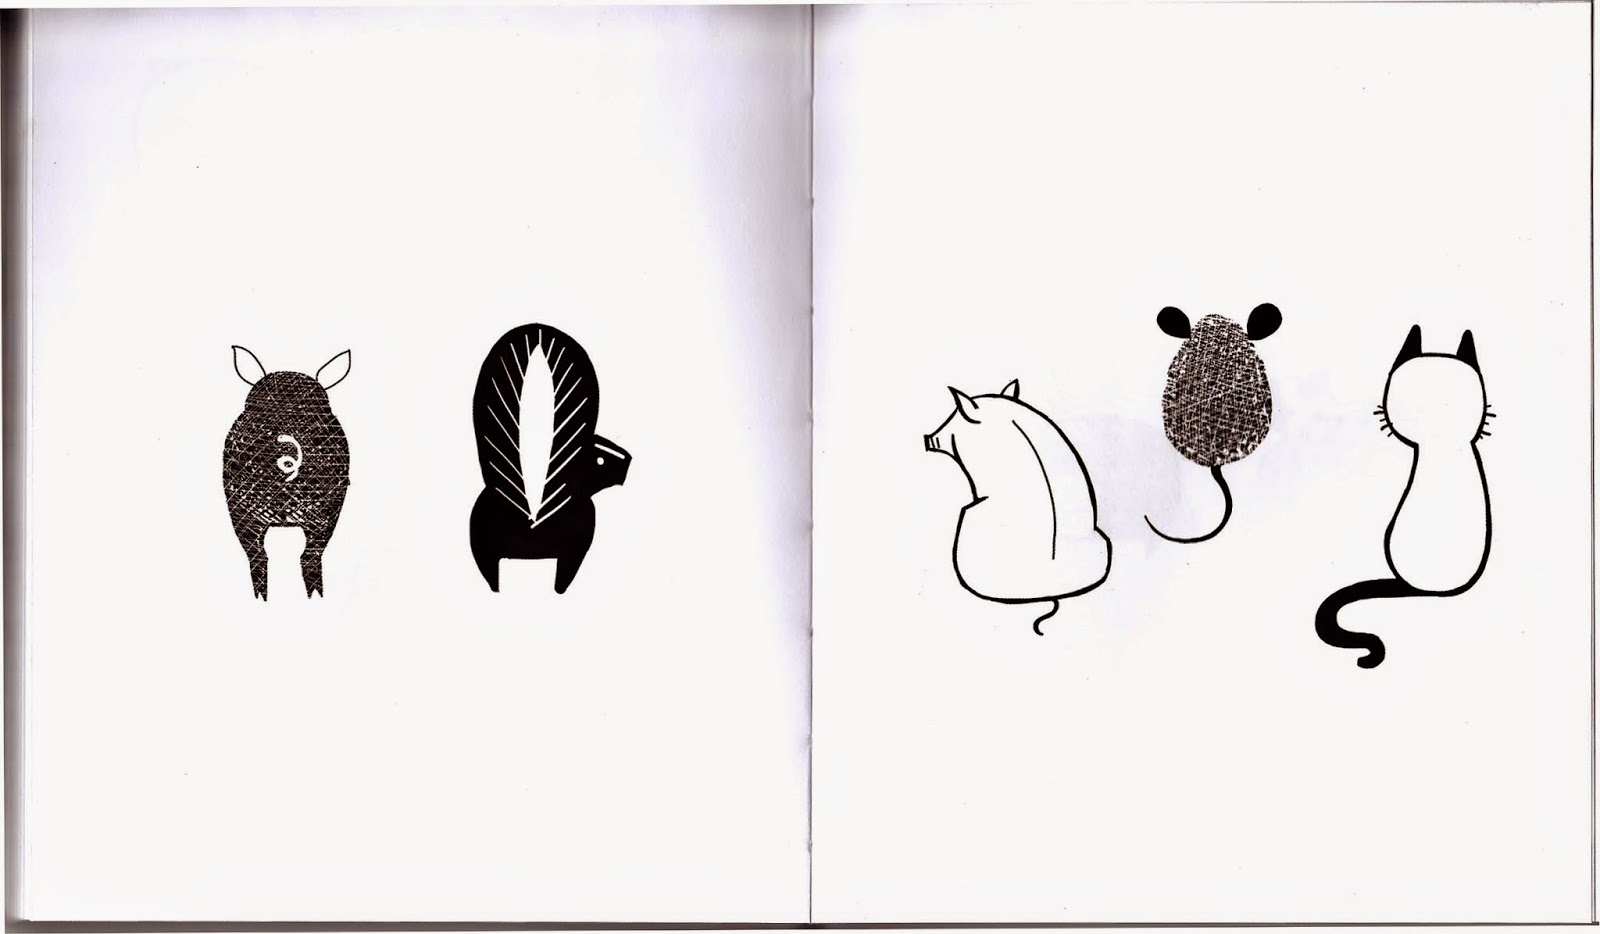 Drawn cute awesome #6